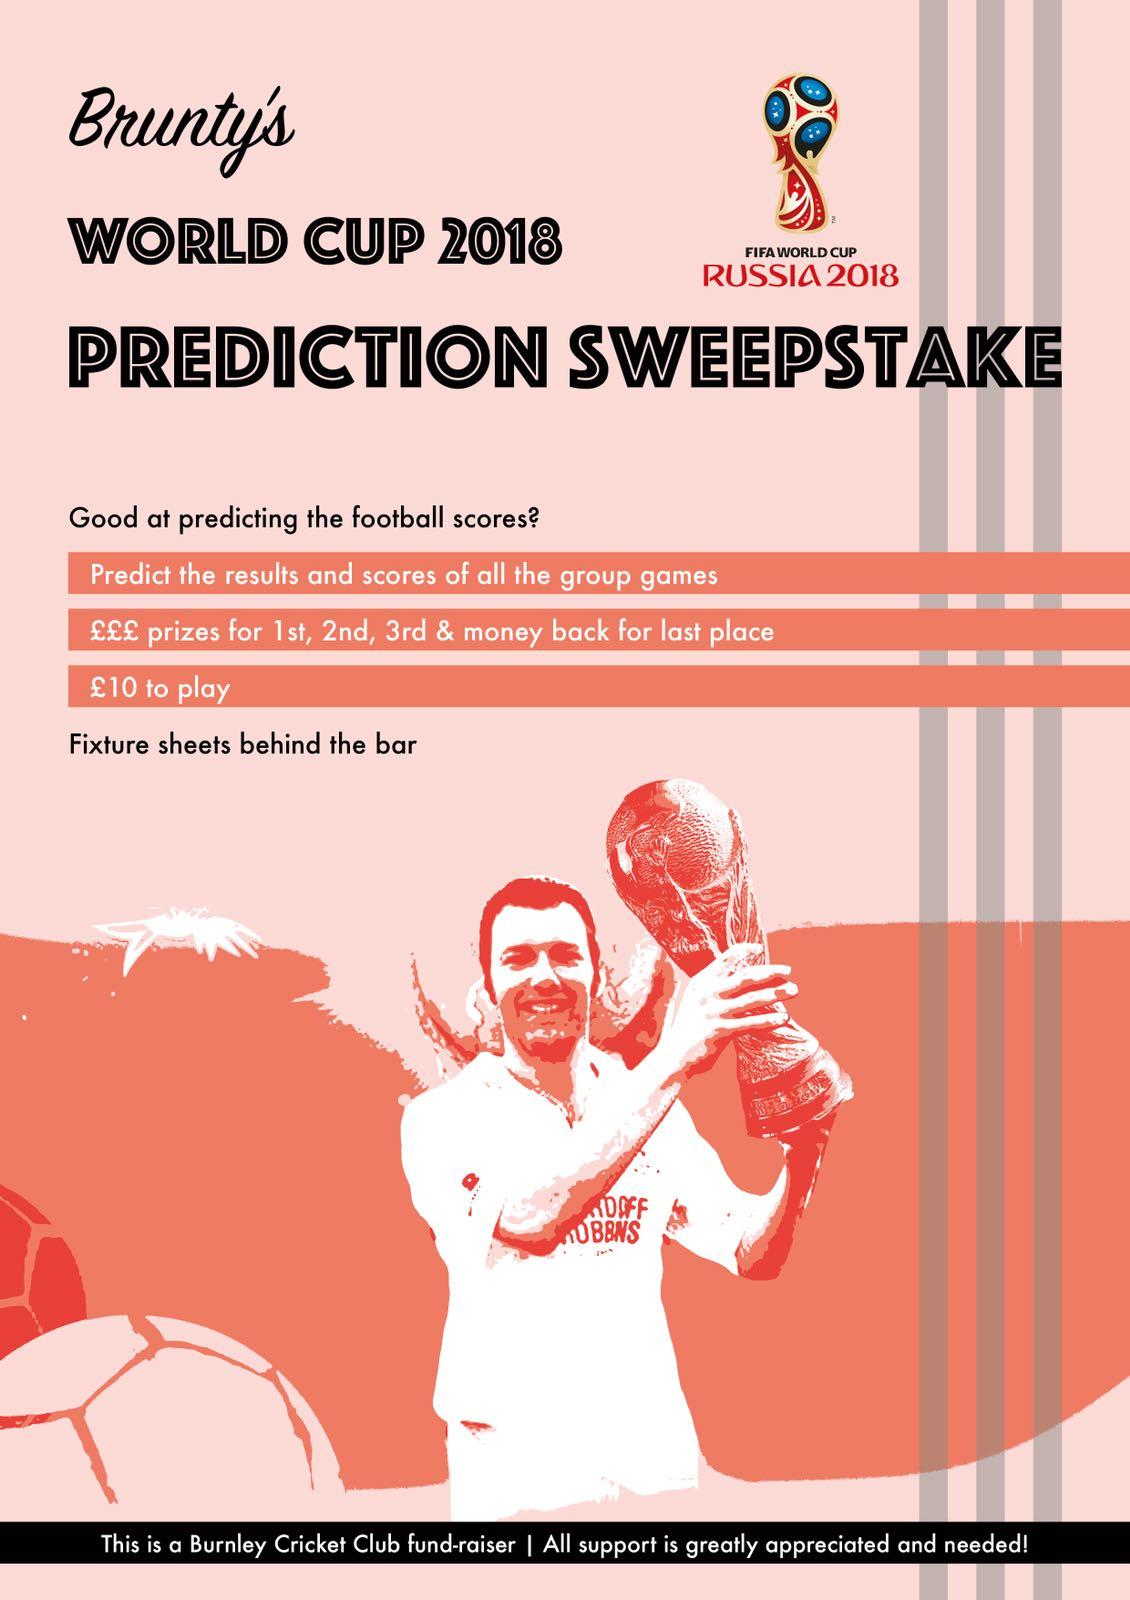 burnley+cricket+club+world+cup+prediction+sweepstake.jpeg